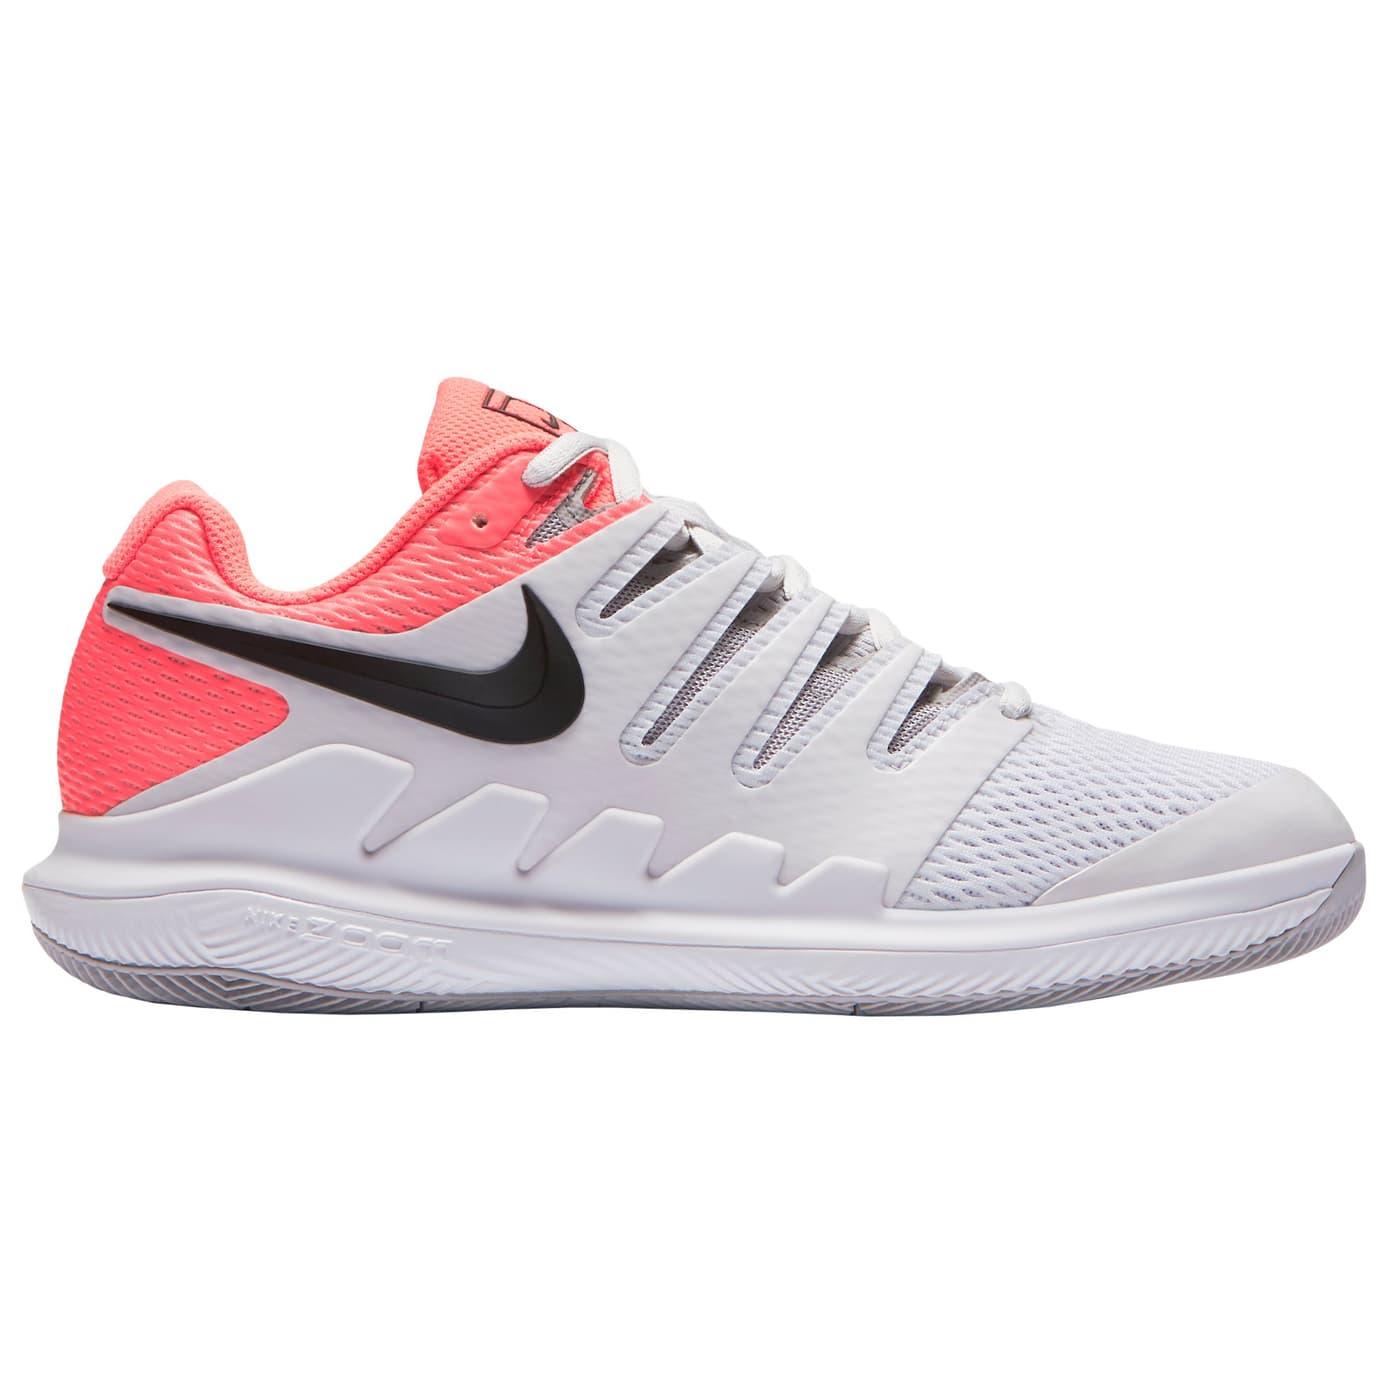 10 De Tennis Chaussures Zoom Homme Air Pour Migros Nike Vapor qARtU1w